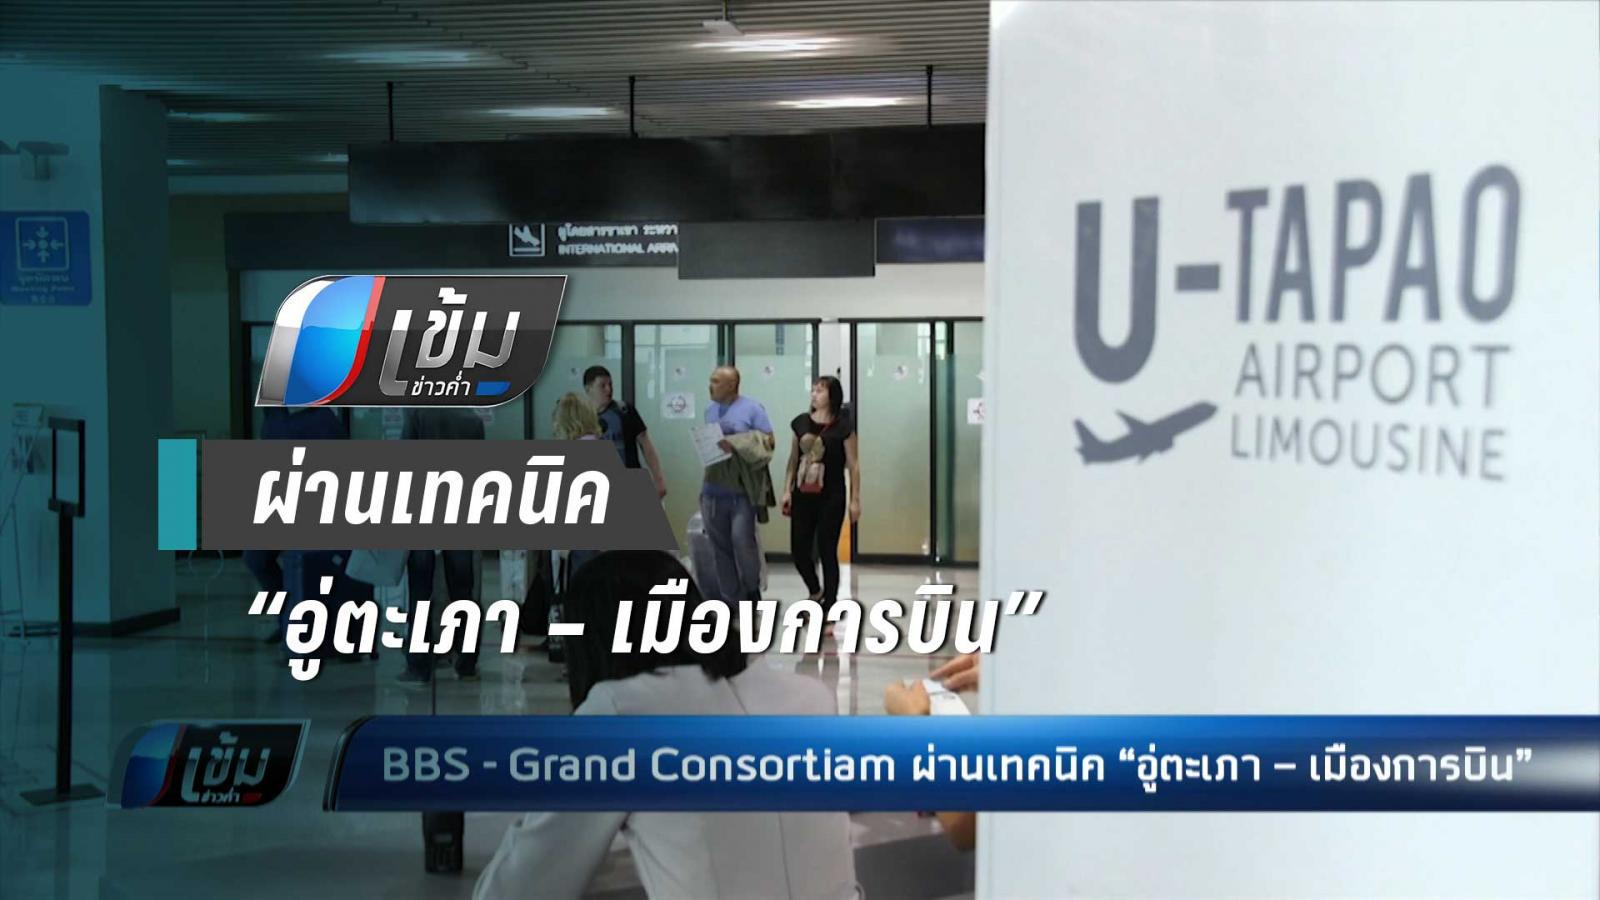 "BBS - Grand Consortiam ผ่านเทคนิค ""อู่ตะเภา – เมืองการบิน"""